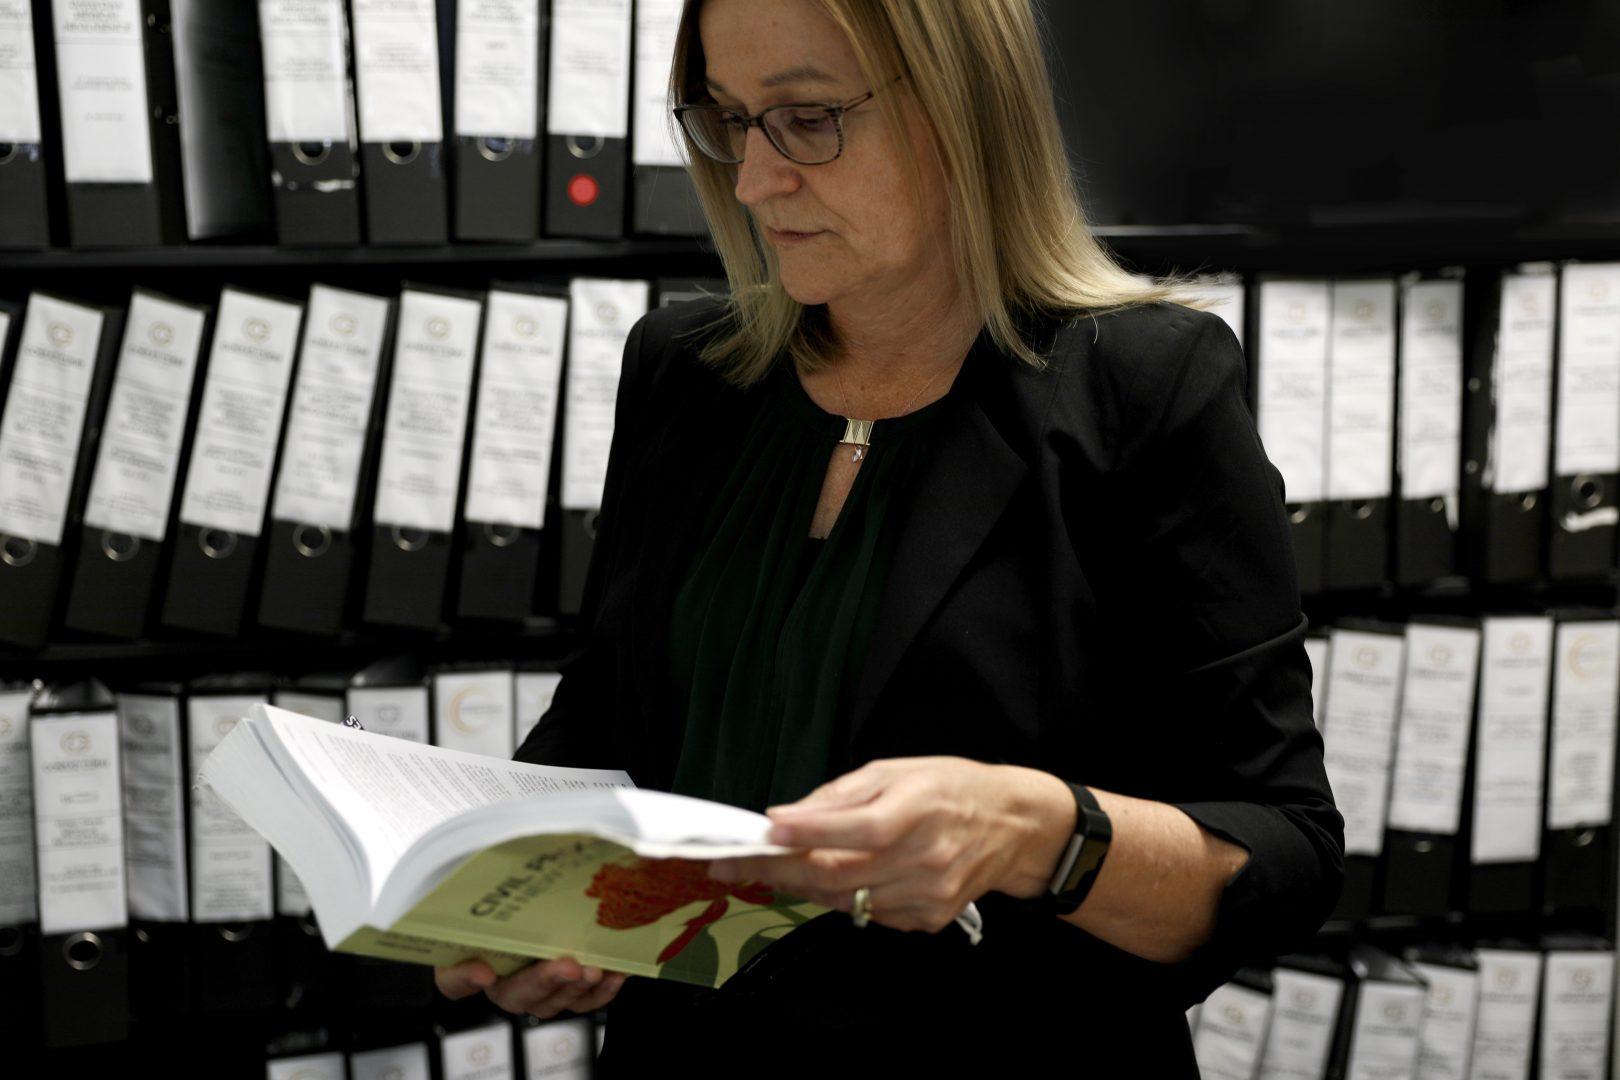 Henriette Boonen Reviewing Files